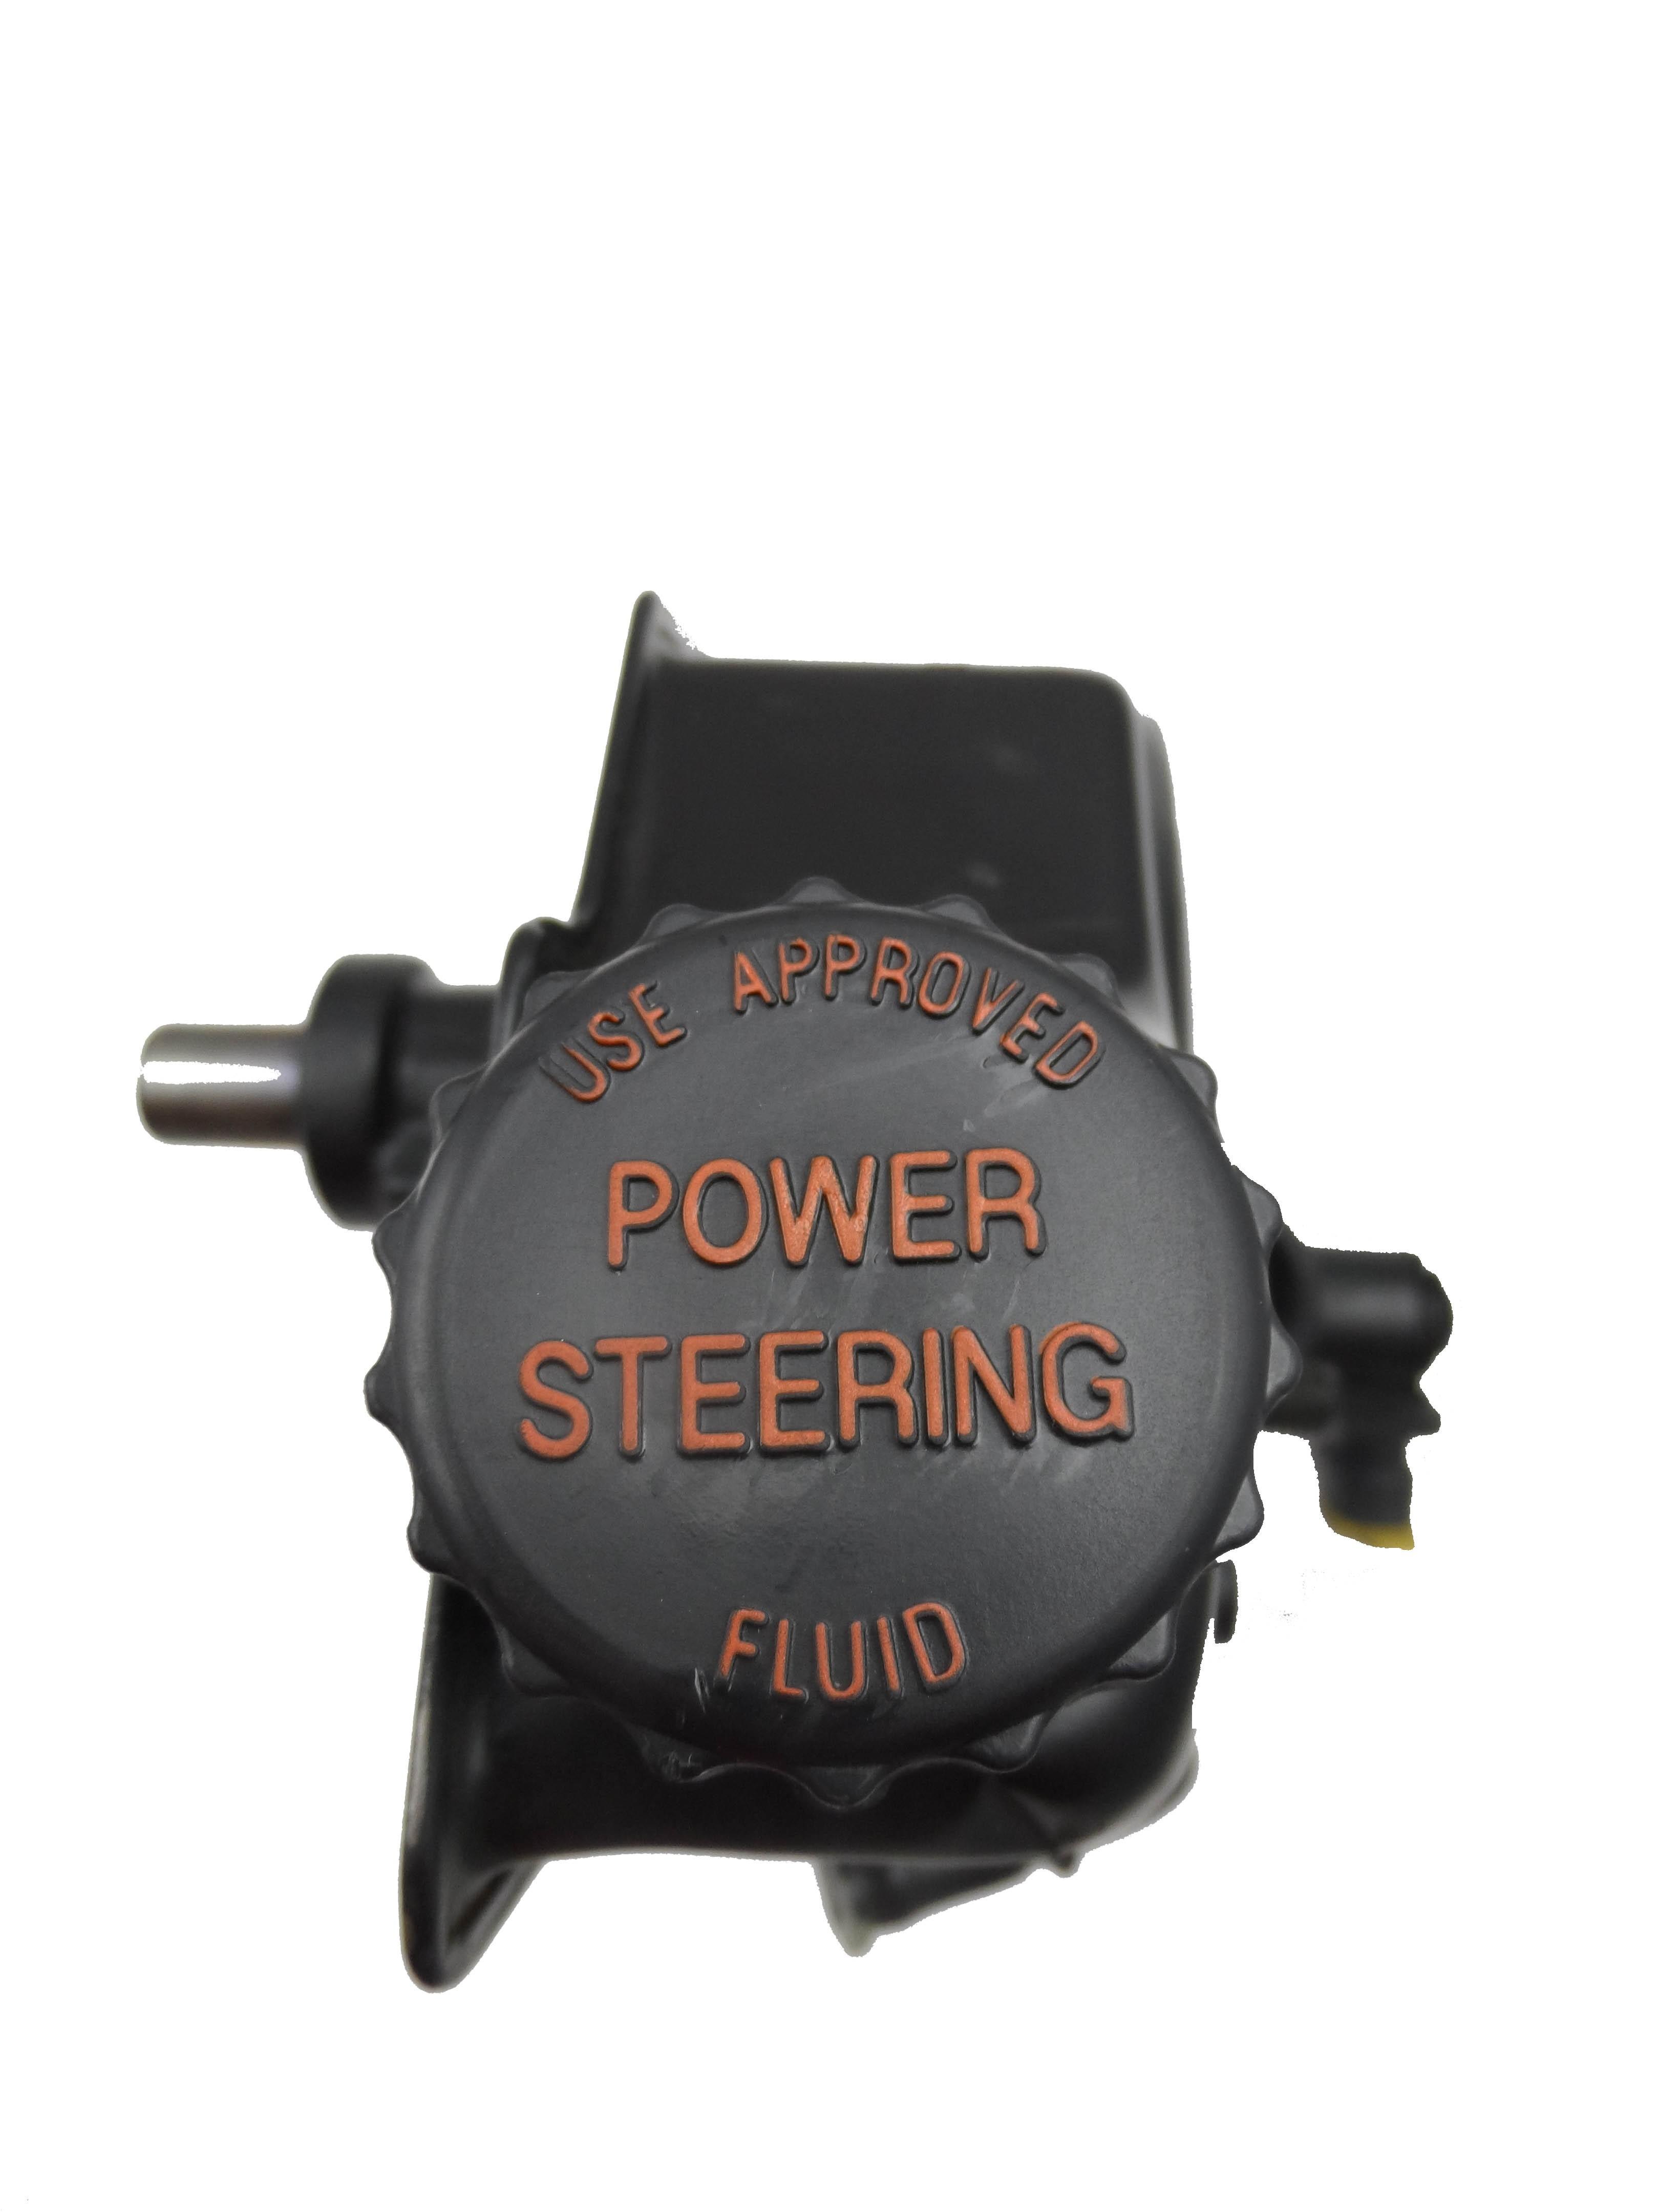 2002 Chevrolet Silverado2500hd Power Steering Pressure Hose Omega